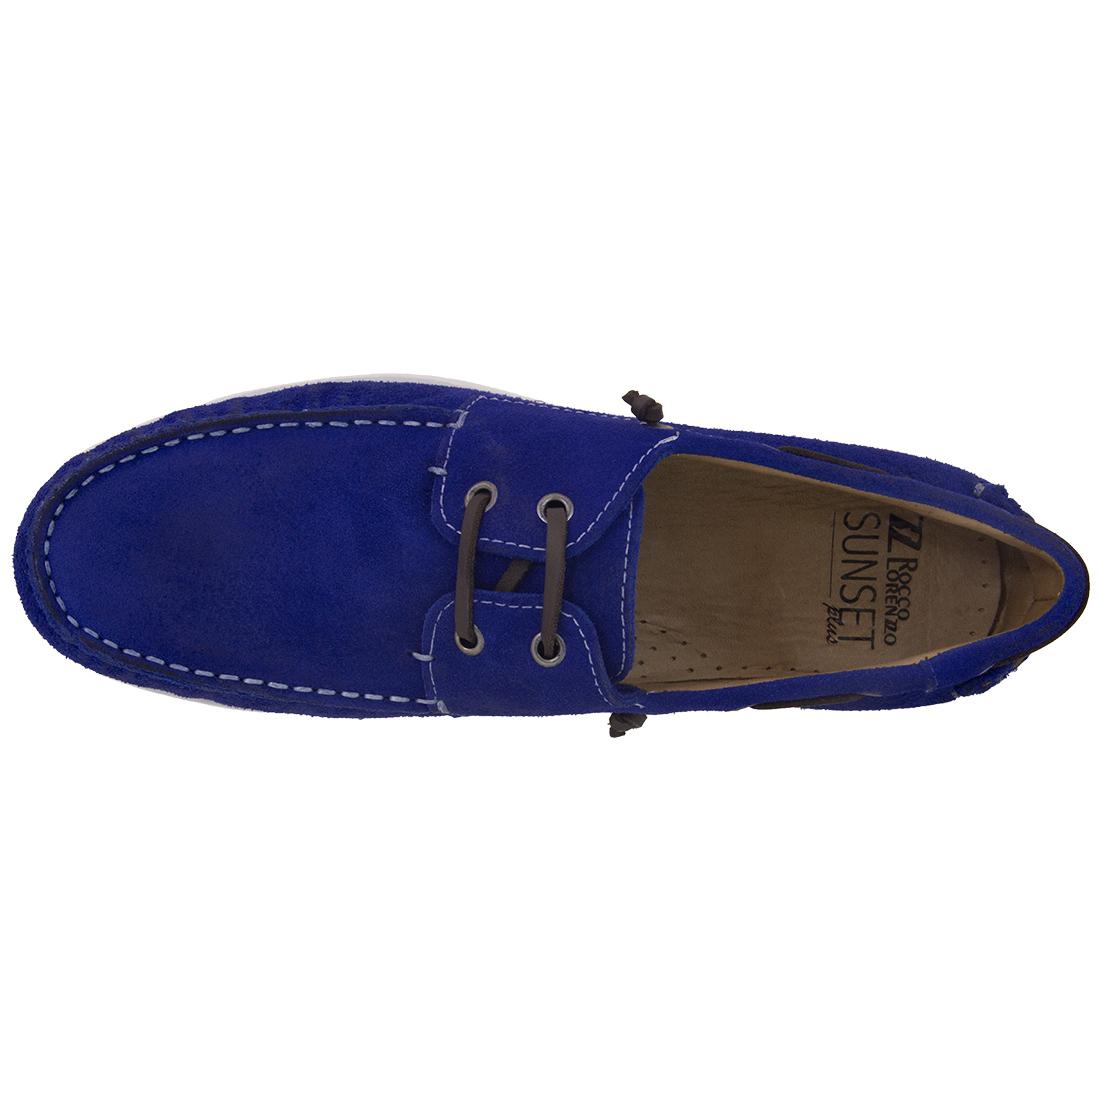 Dockside Masculino Camurça Azul Bic - Rocco Lorenzzo - 4411